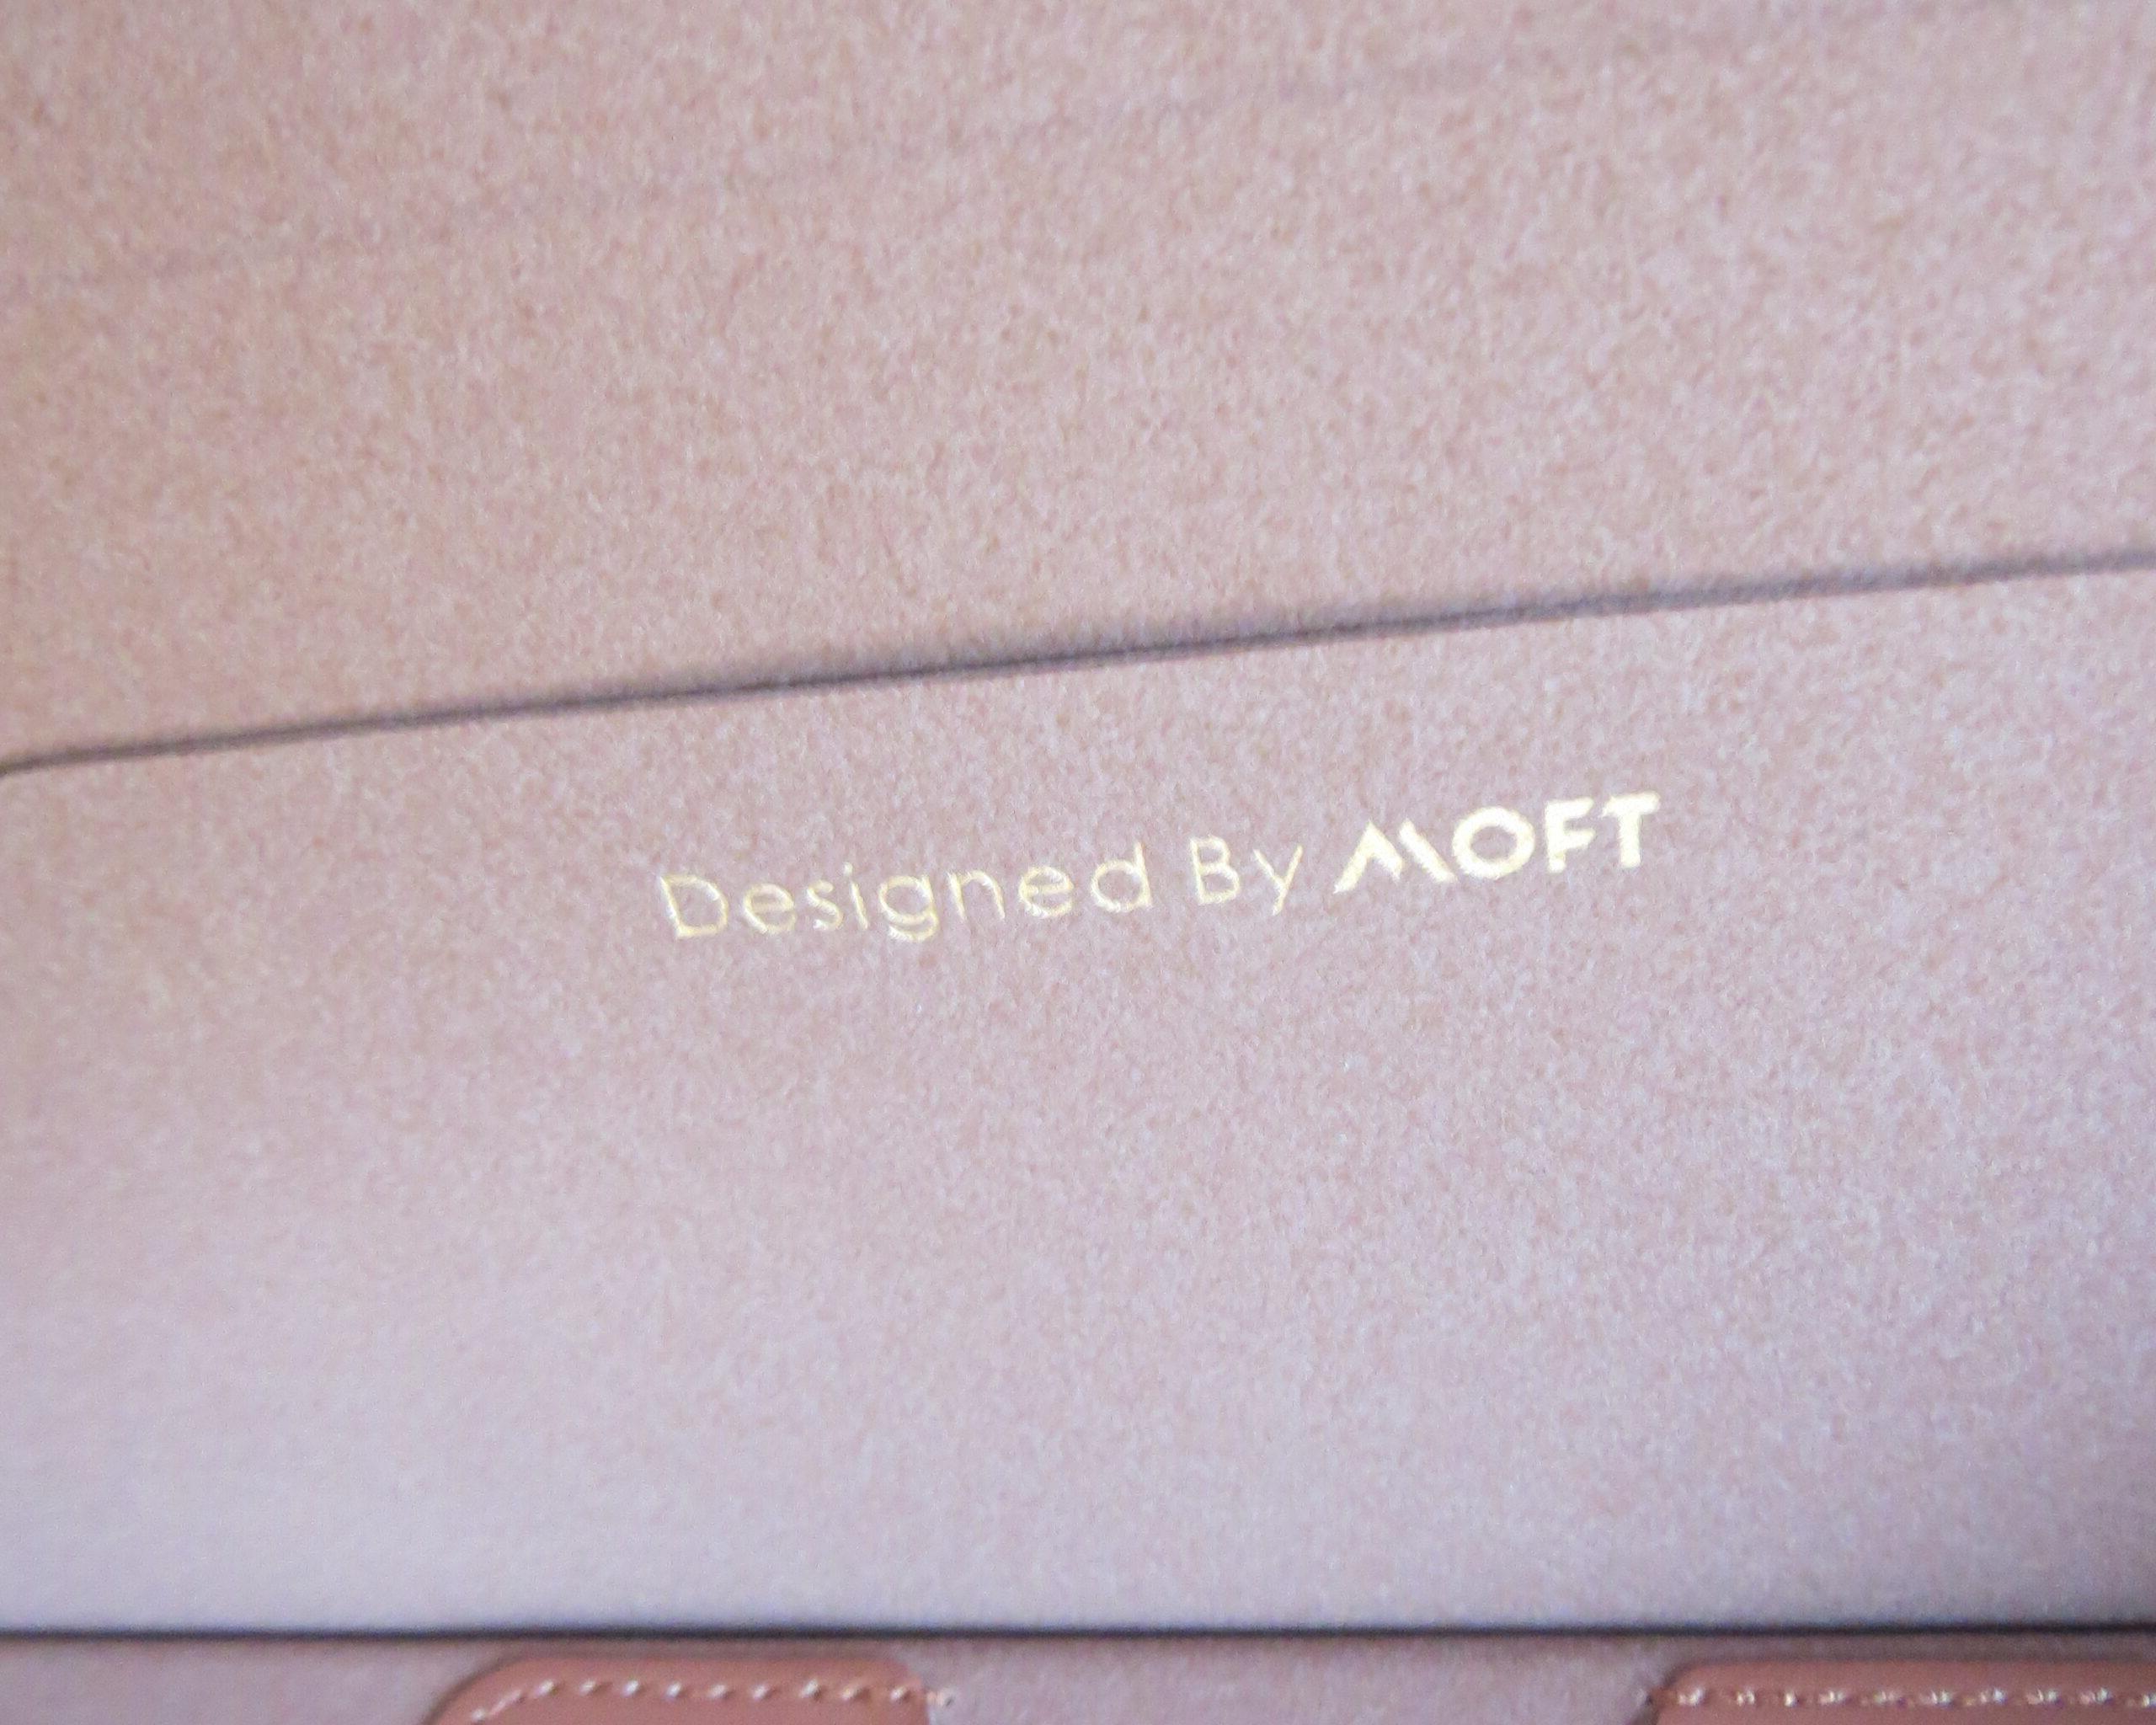 Designed By MOFTの文字